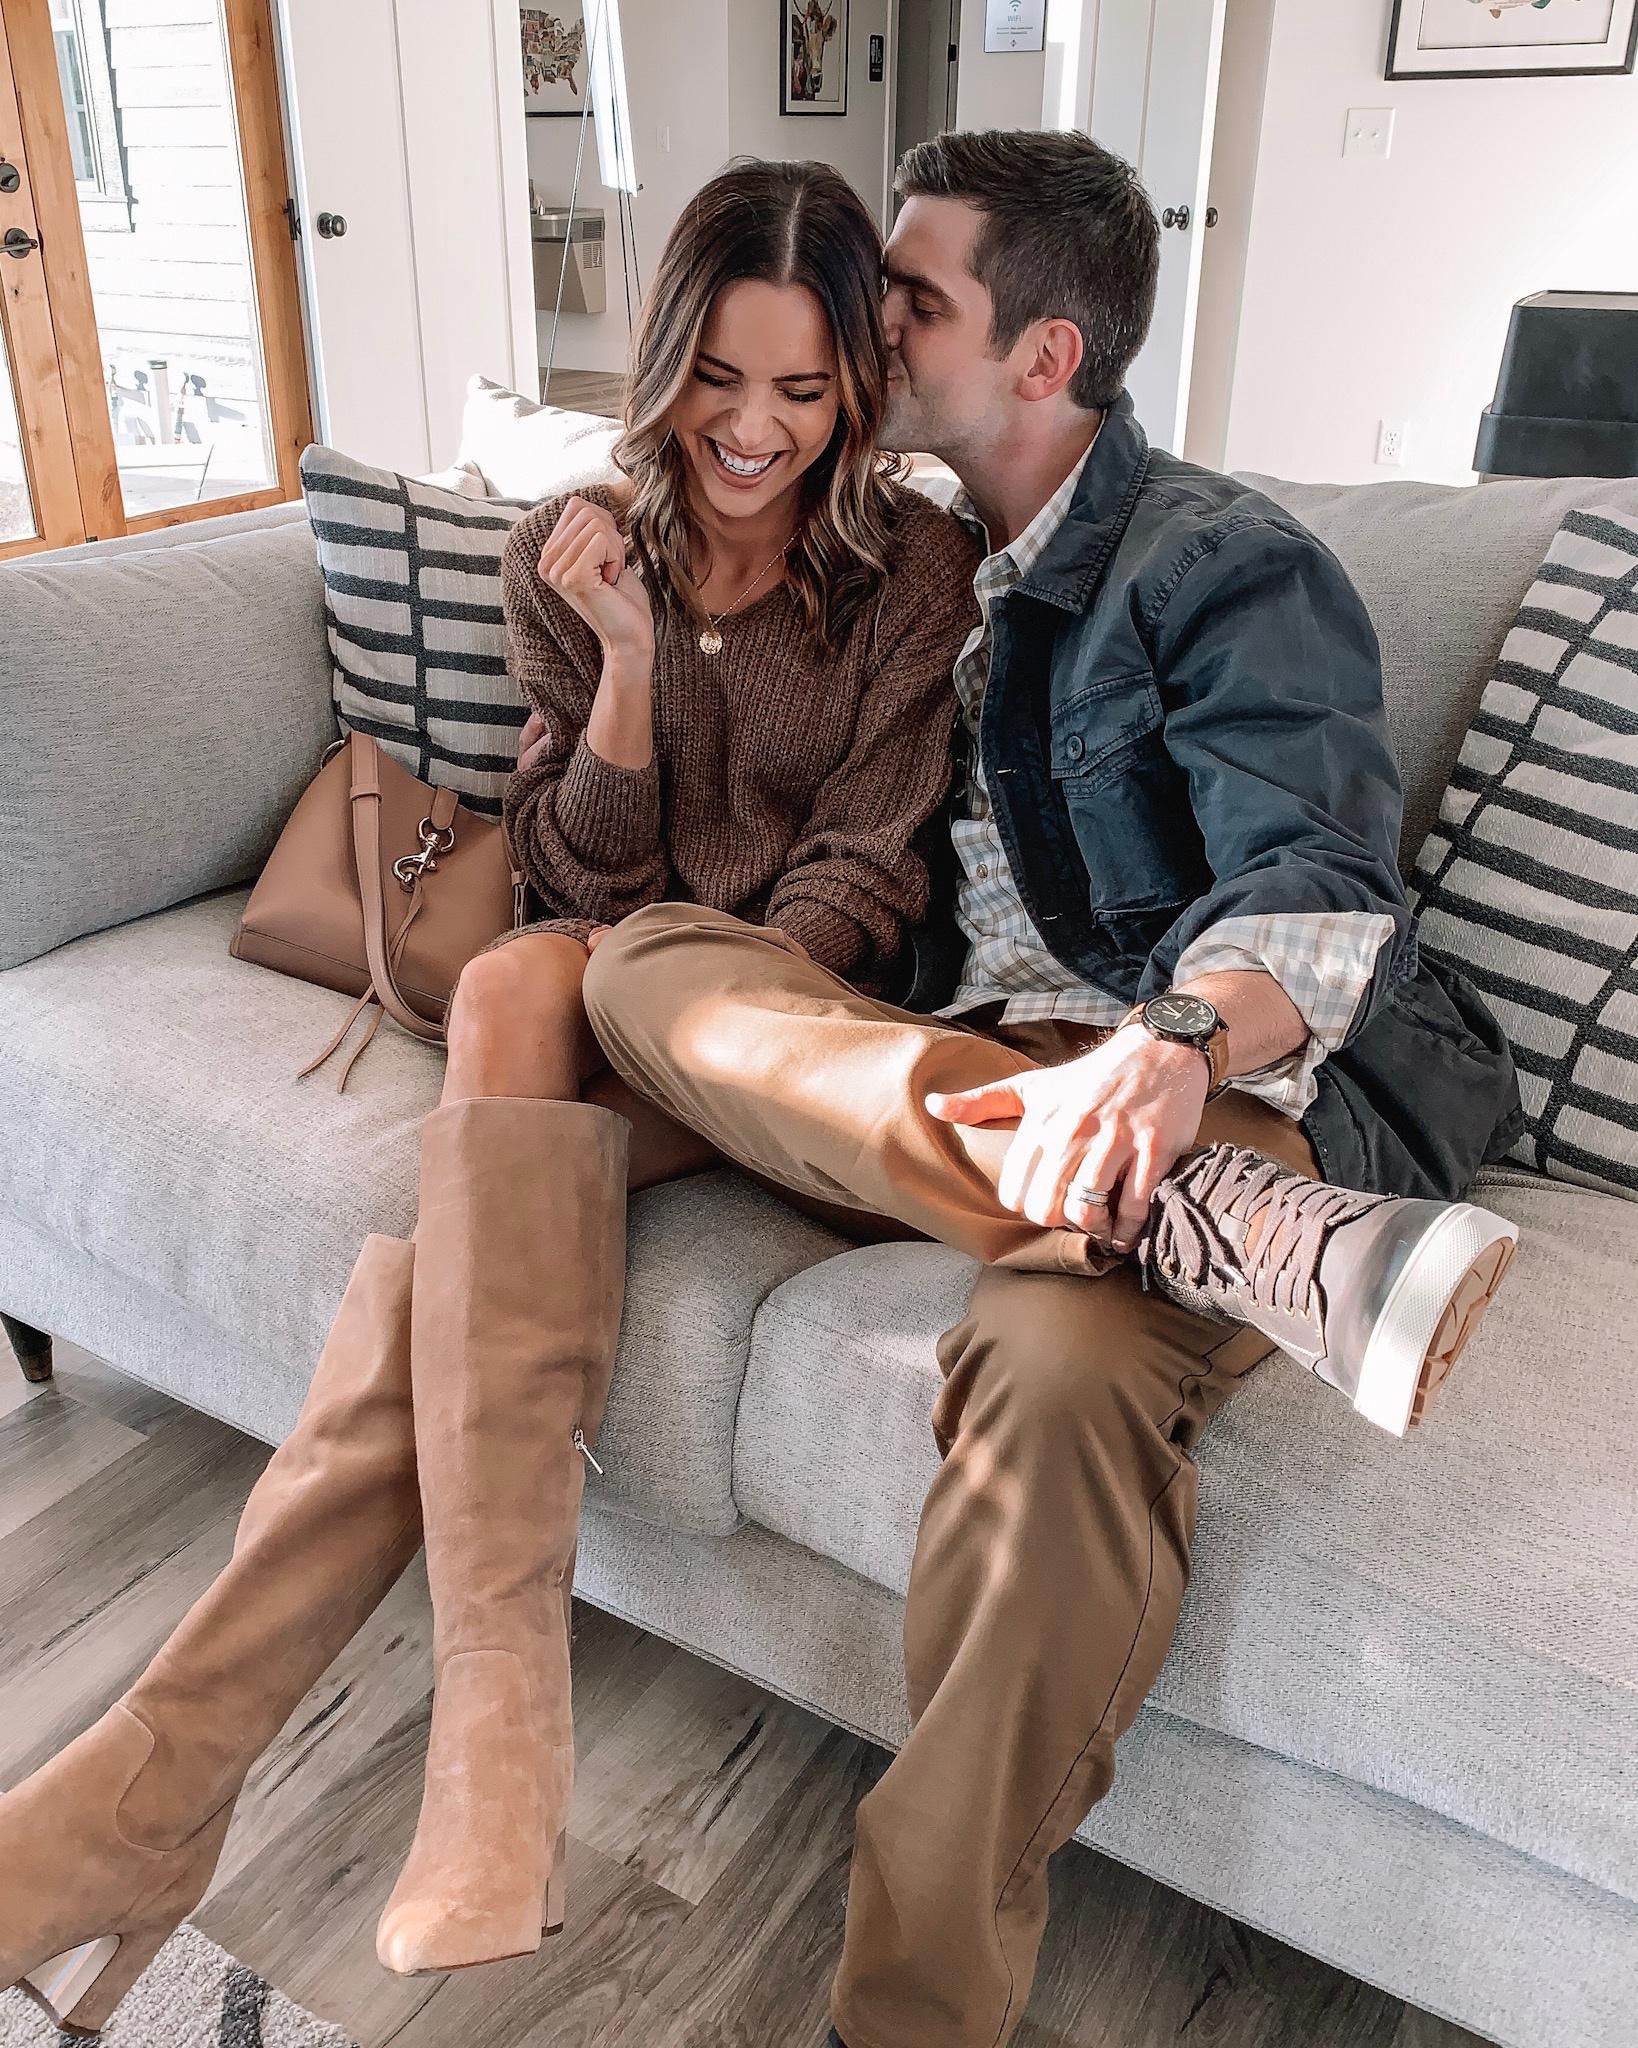 tom q&a, nordstrom menswear, men's fall fashion, family photo dad outfit, sam Edelman hai boots